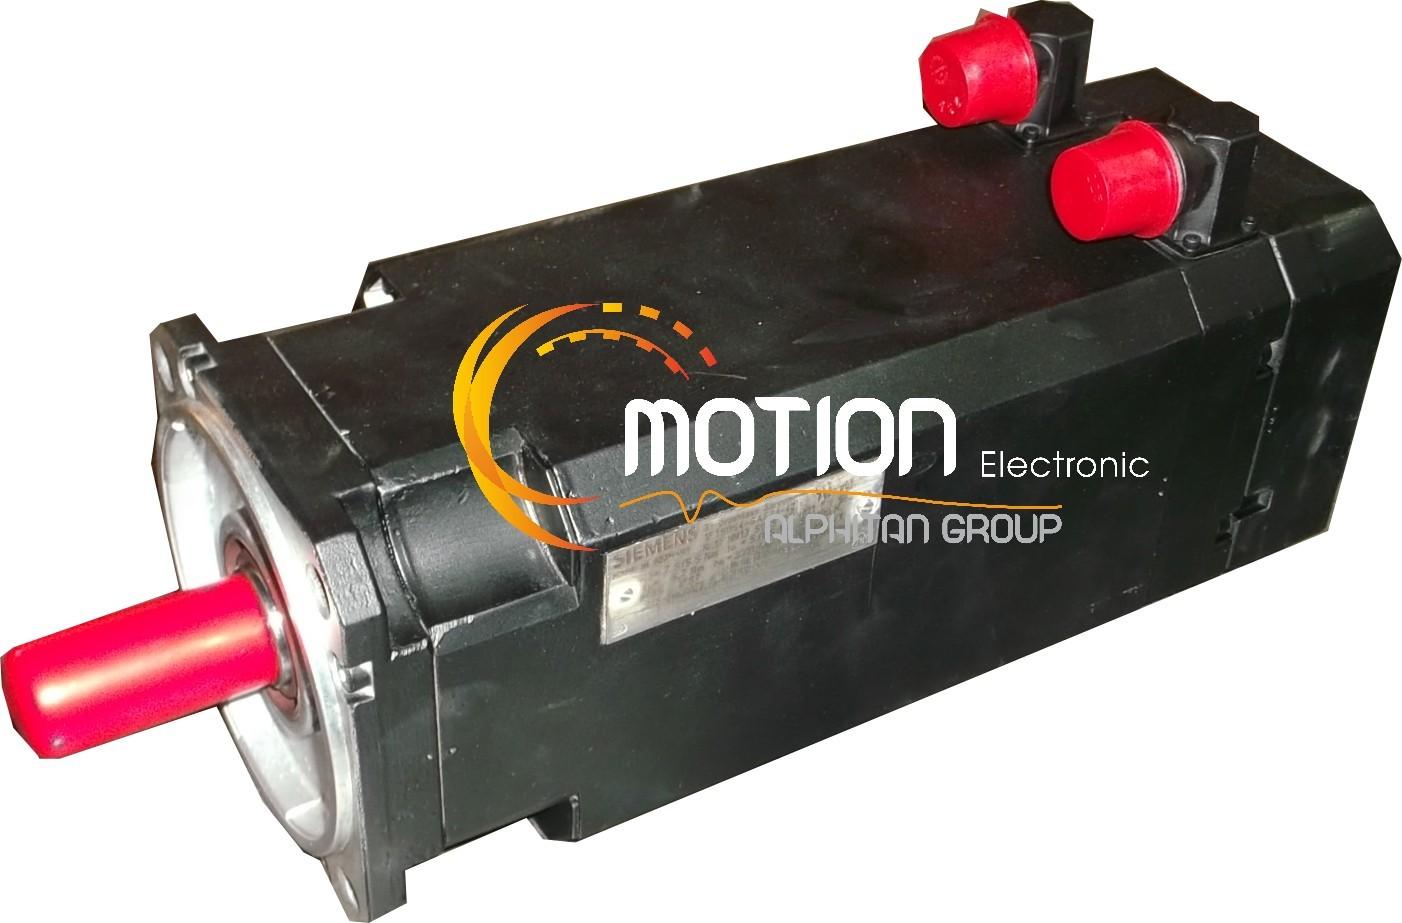 Siemens 1ft6064 6af71 4ea2 motor for Siemens electric motors catalog